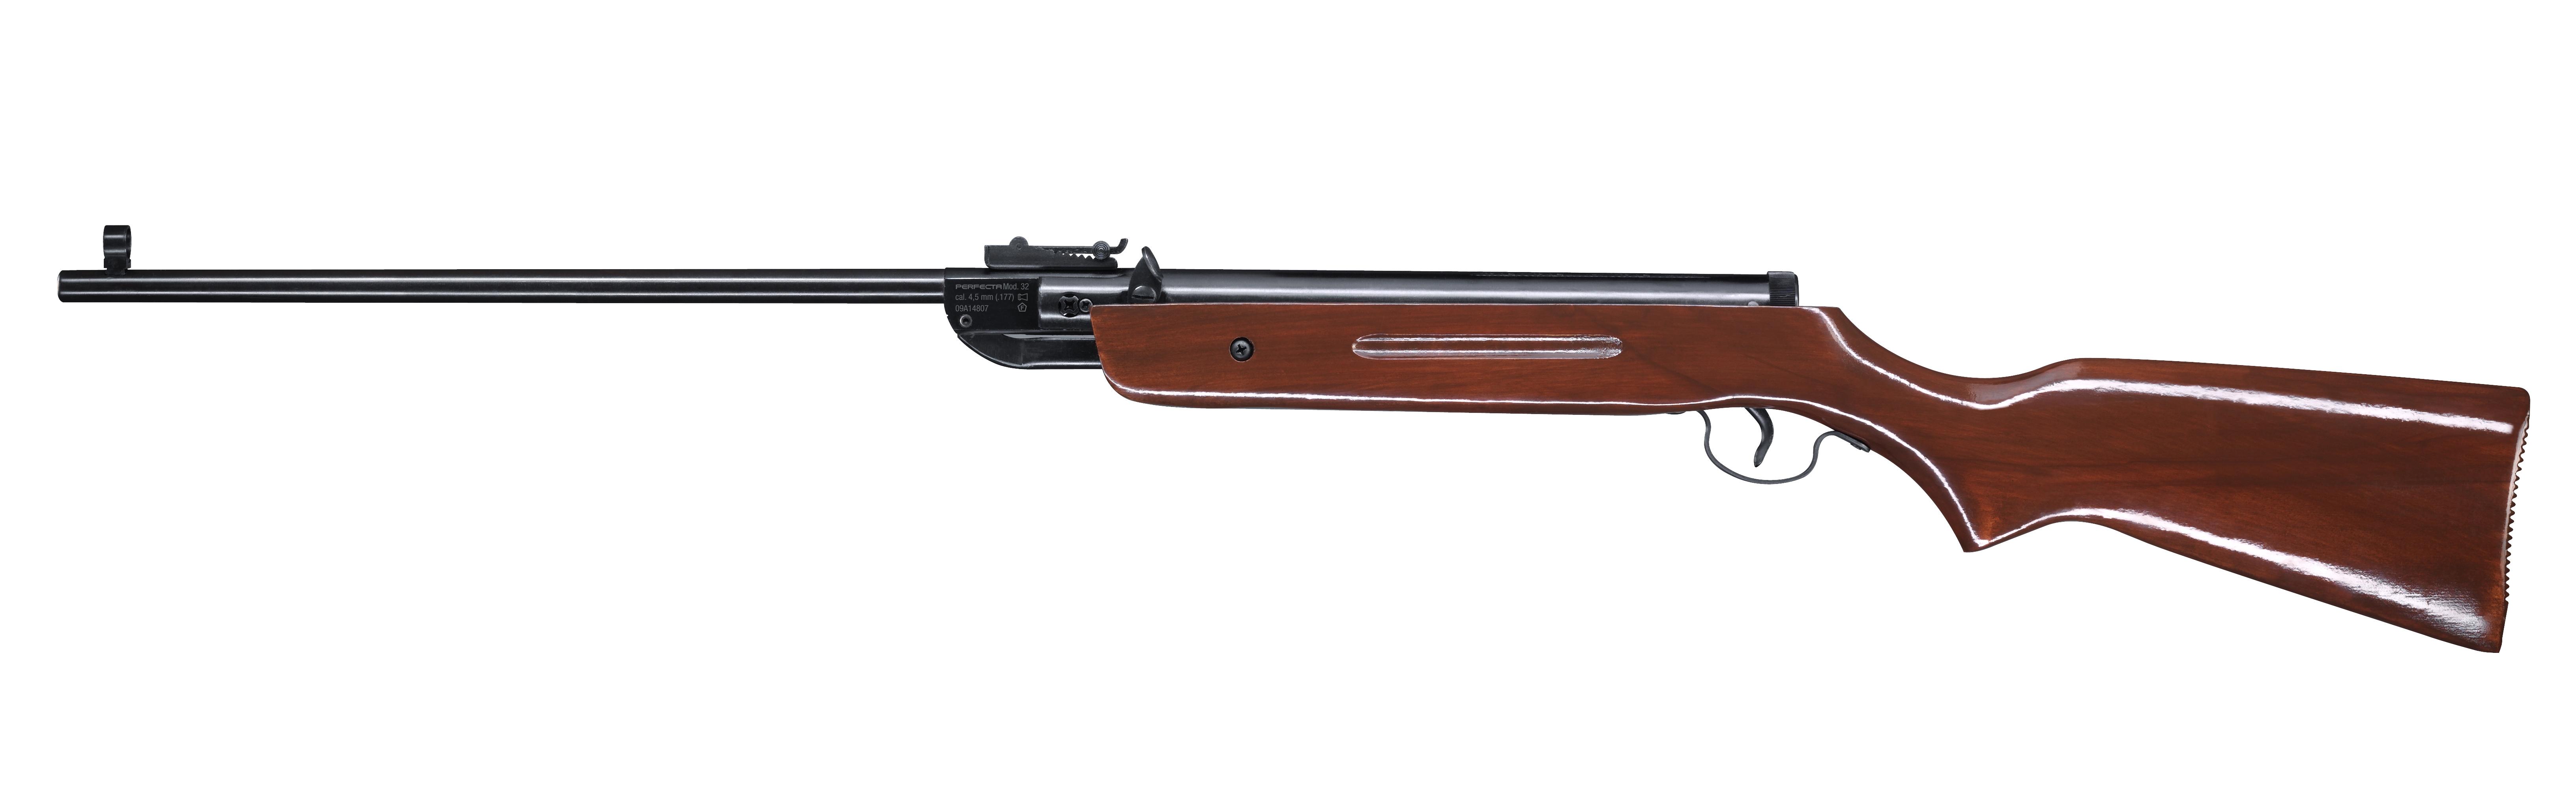 PERFECTA (Umarex) Spring Operated Airgun Model 32